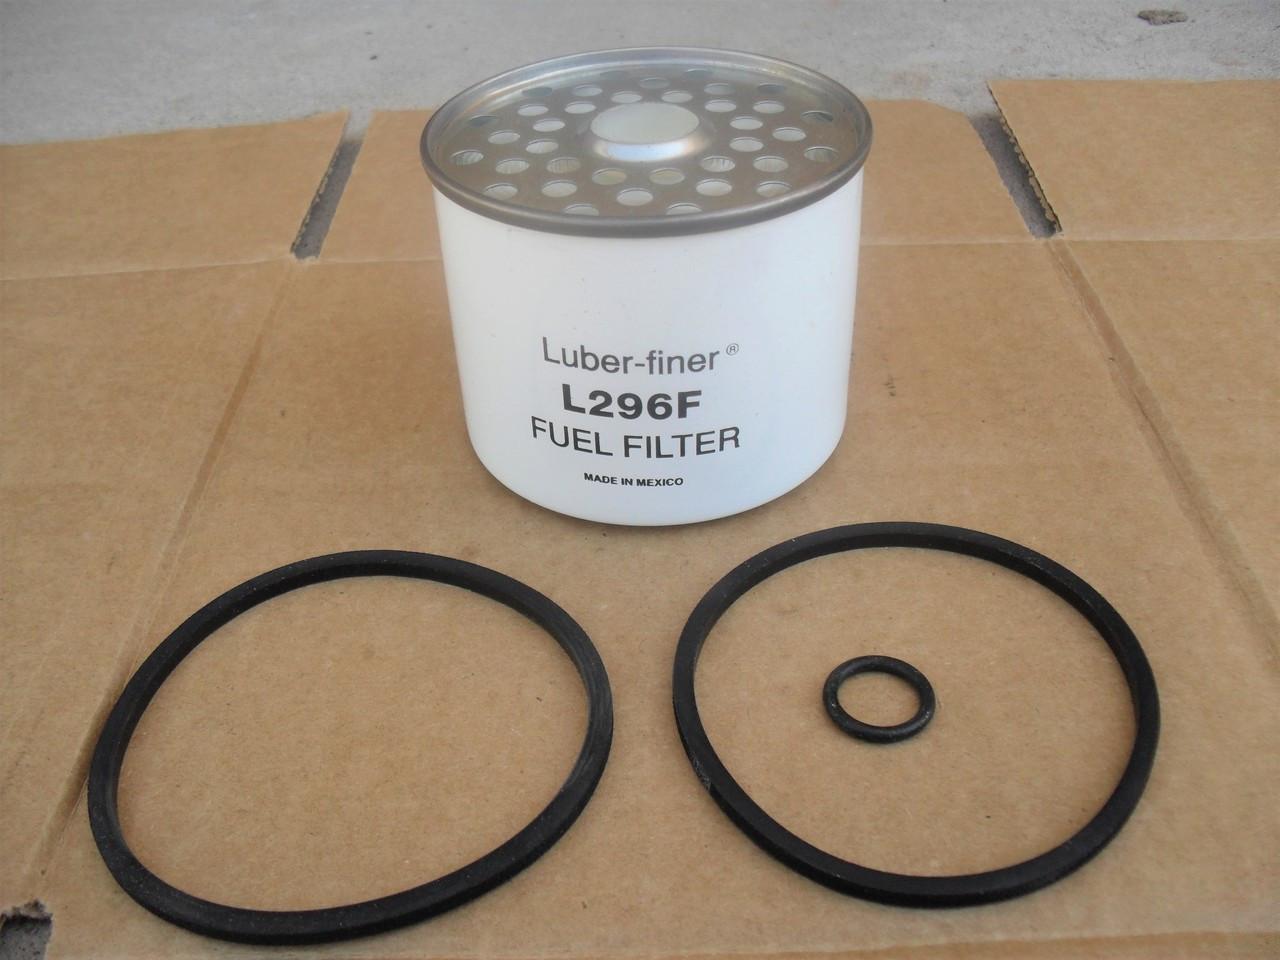 fuel filter for vermeer m450 m475 m485 m485 m50 v430 v434 trencher 15340001 20776001 81557001 www lawnmowerpartstore com [ 1280 x 960 Pixel ]